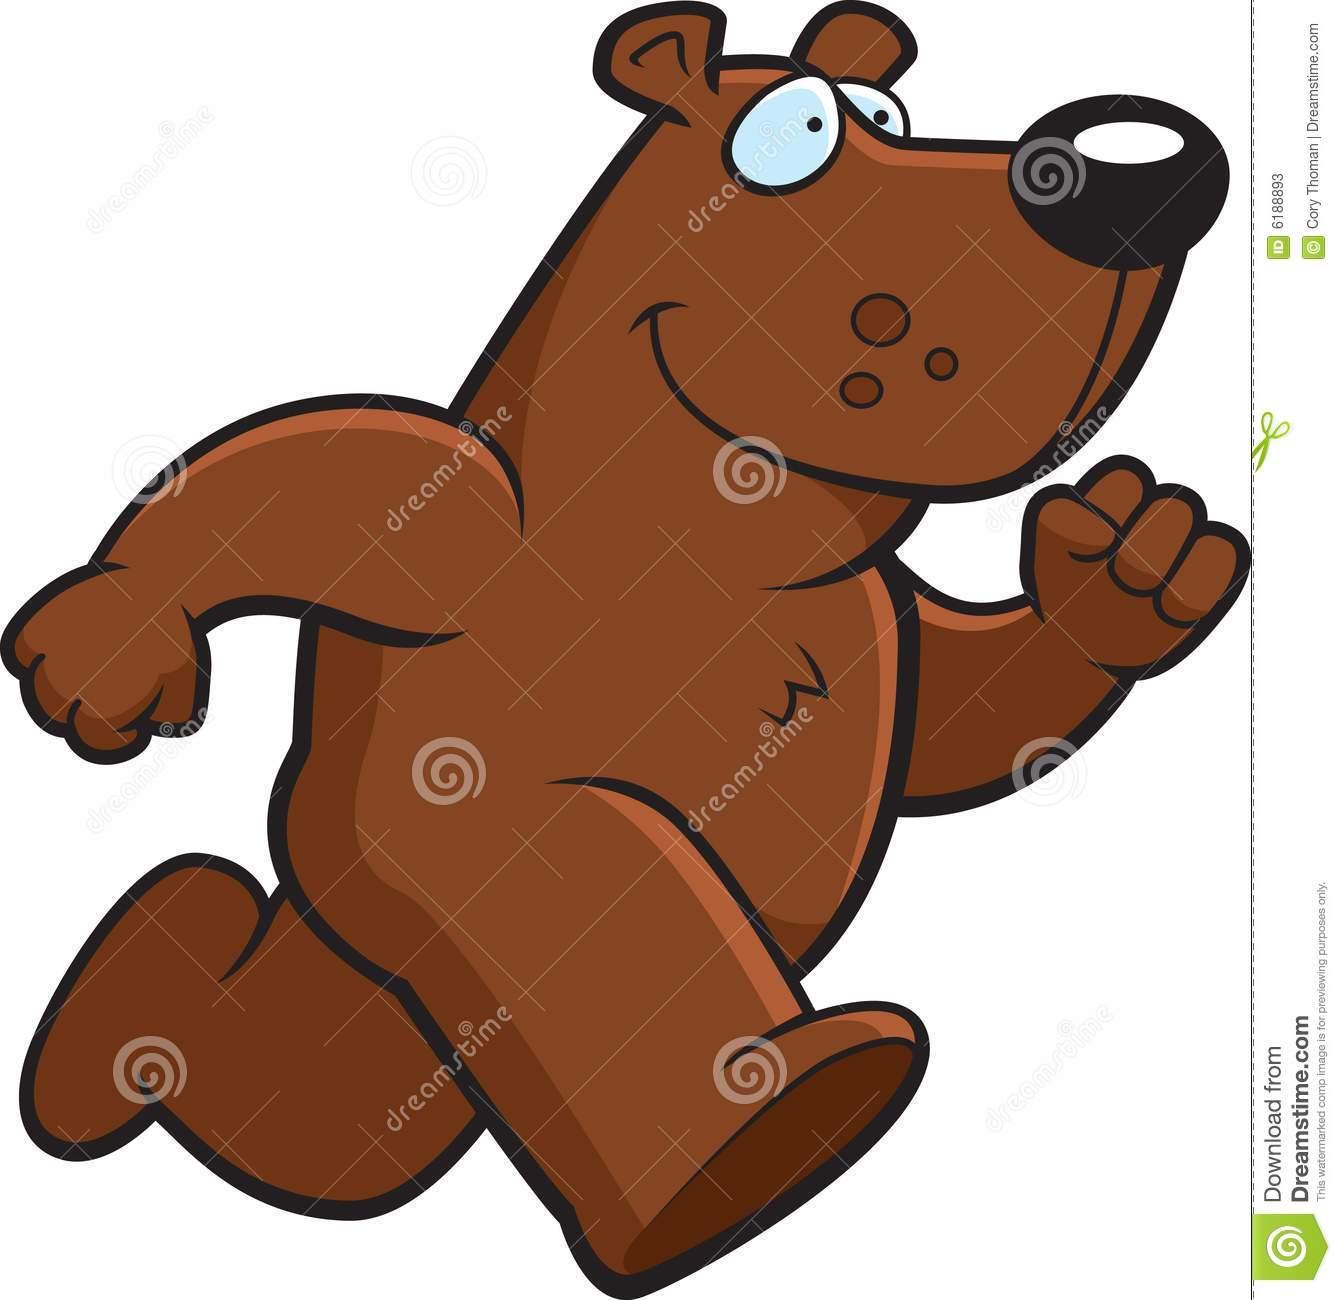 Bear running clipart » Clipart Portal.